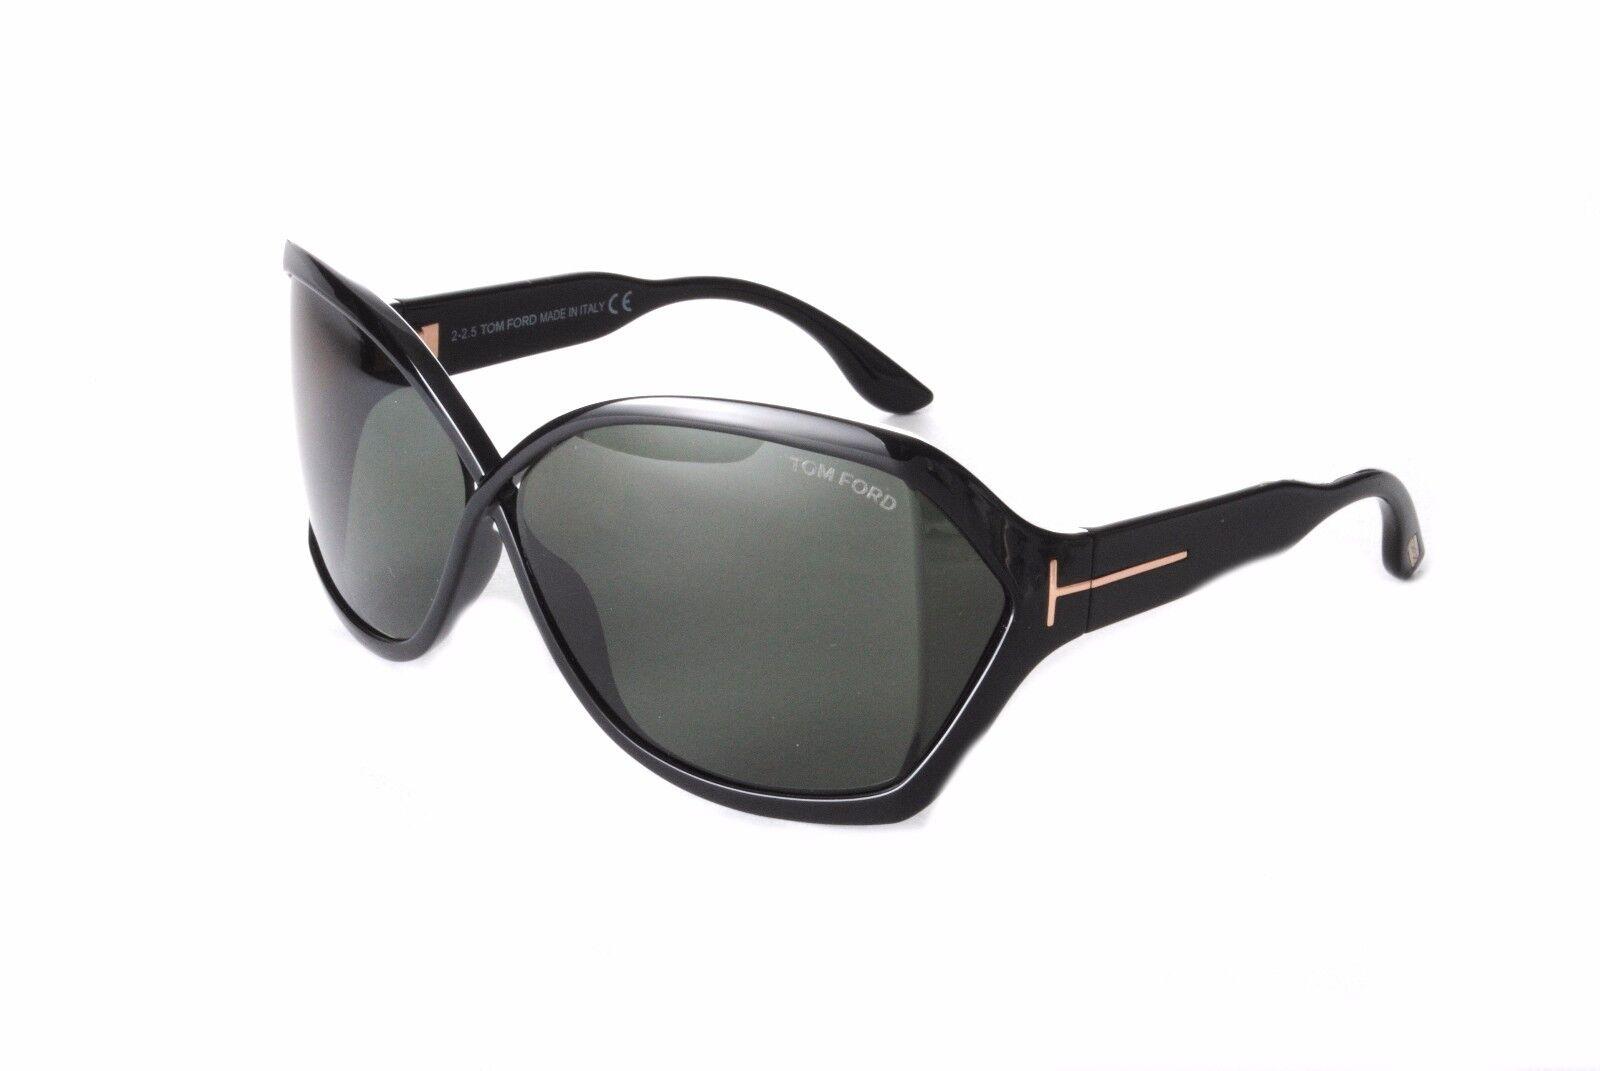 c3b84f35f8 Tom Ford Sunglasses FT0427 S 01N Julianne Black Green 664689717552 ...